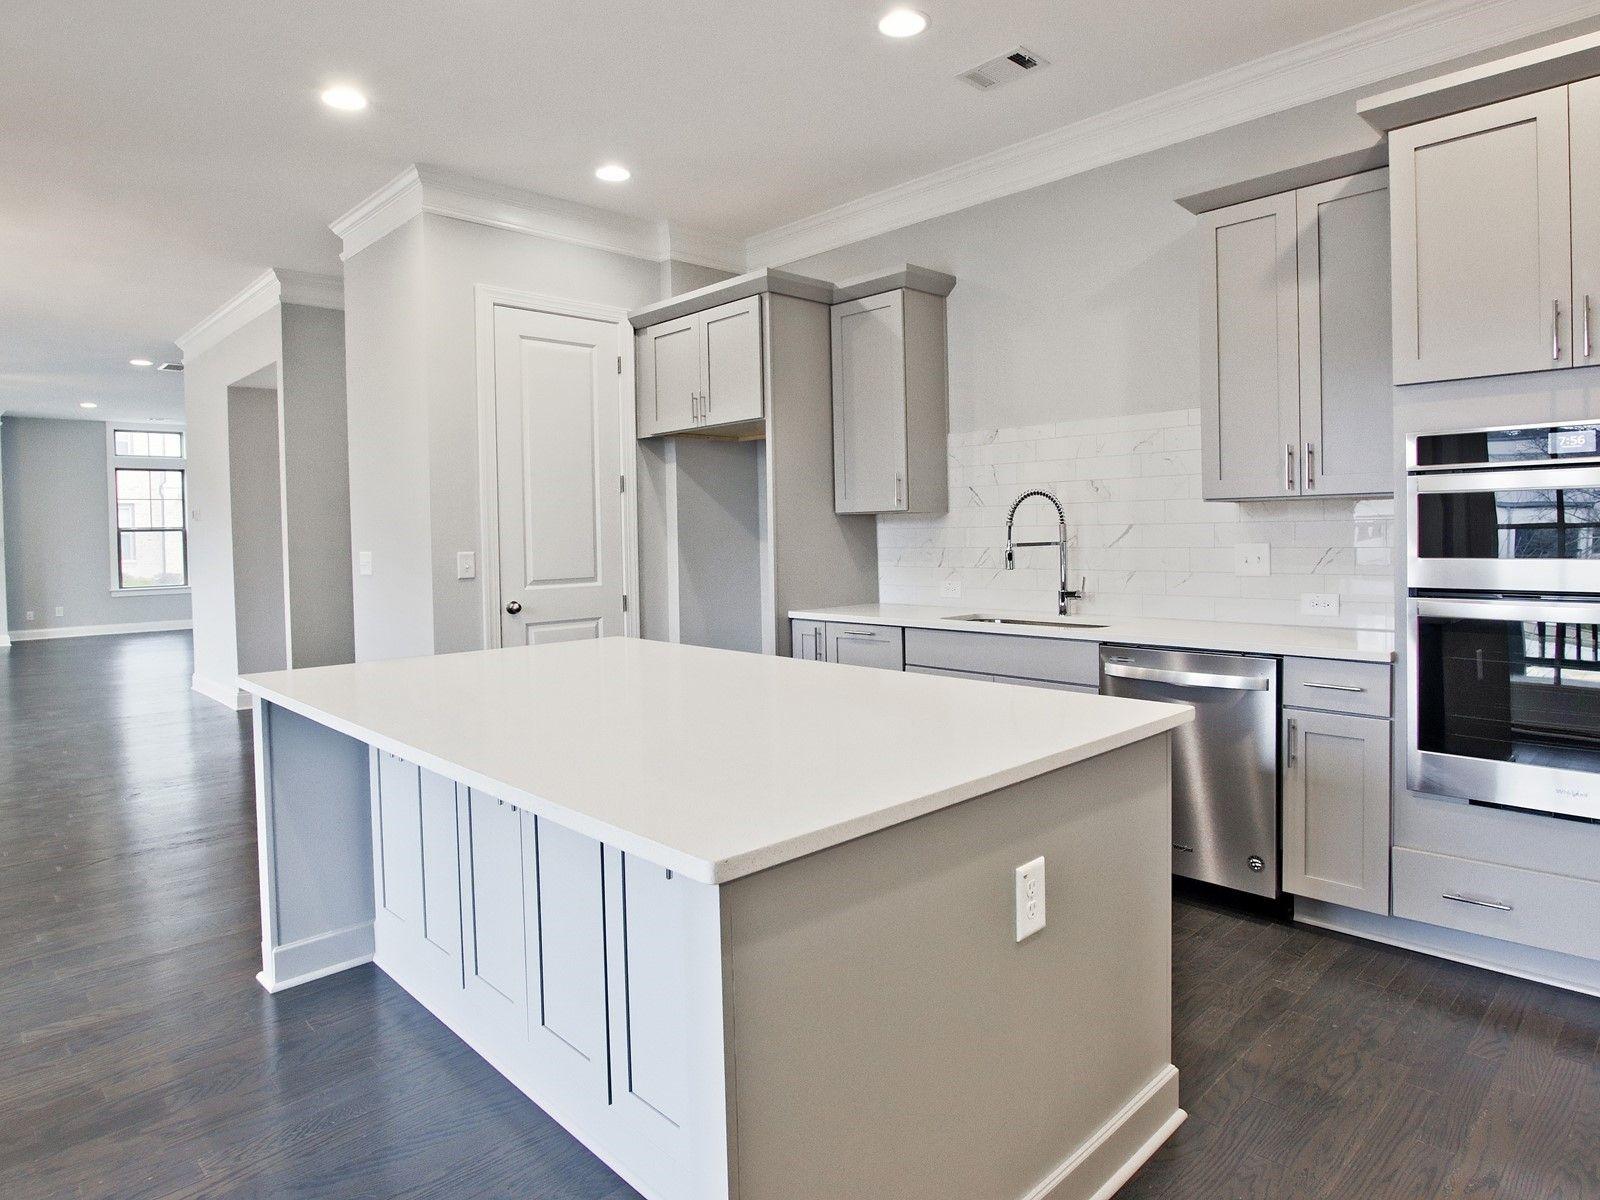 Kitchen featured in the Pavarotti By Ashton Woods in Atlanta, GA